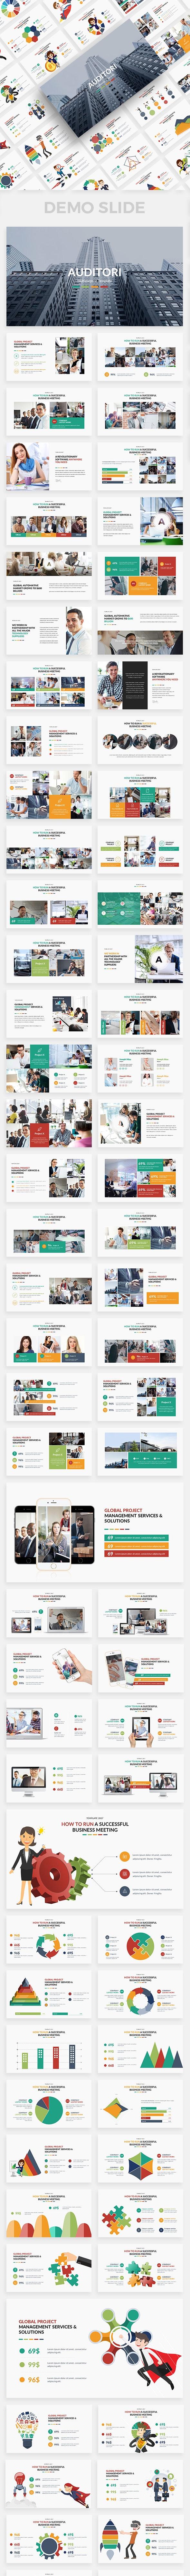 Auditori Project Multipurpose Keynote Template - Business Keynote Templates